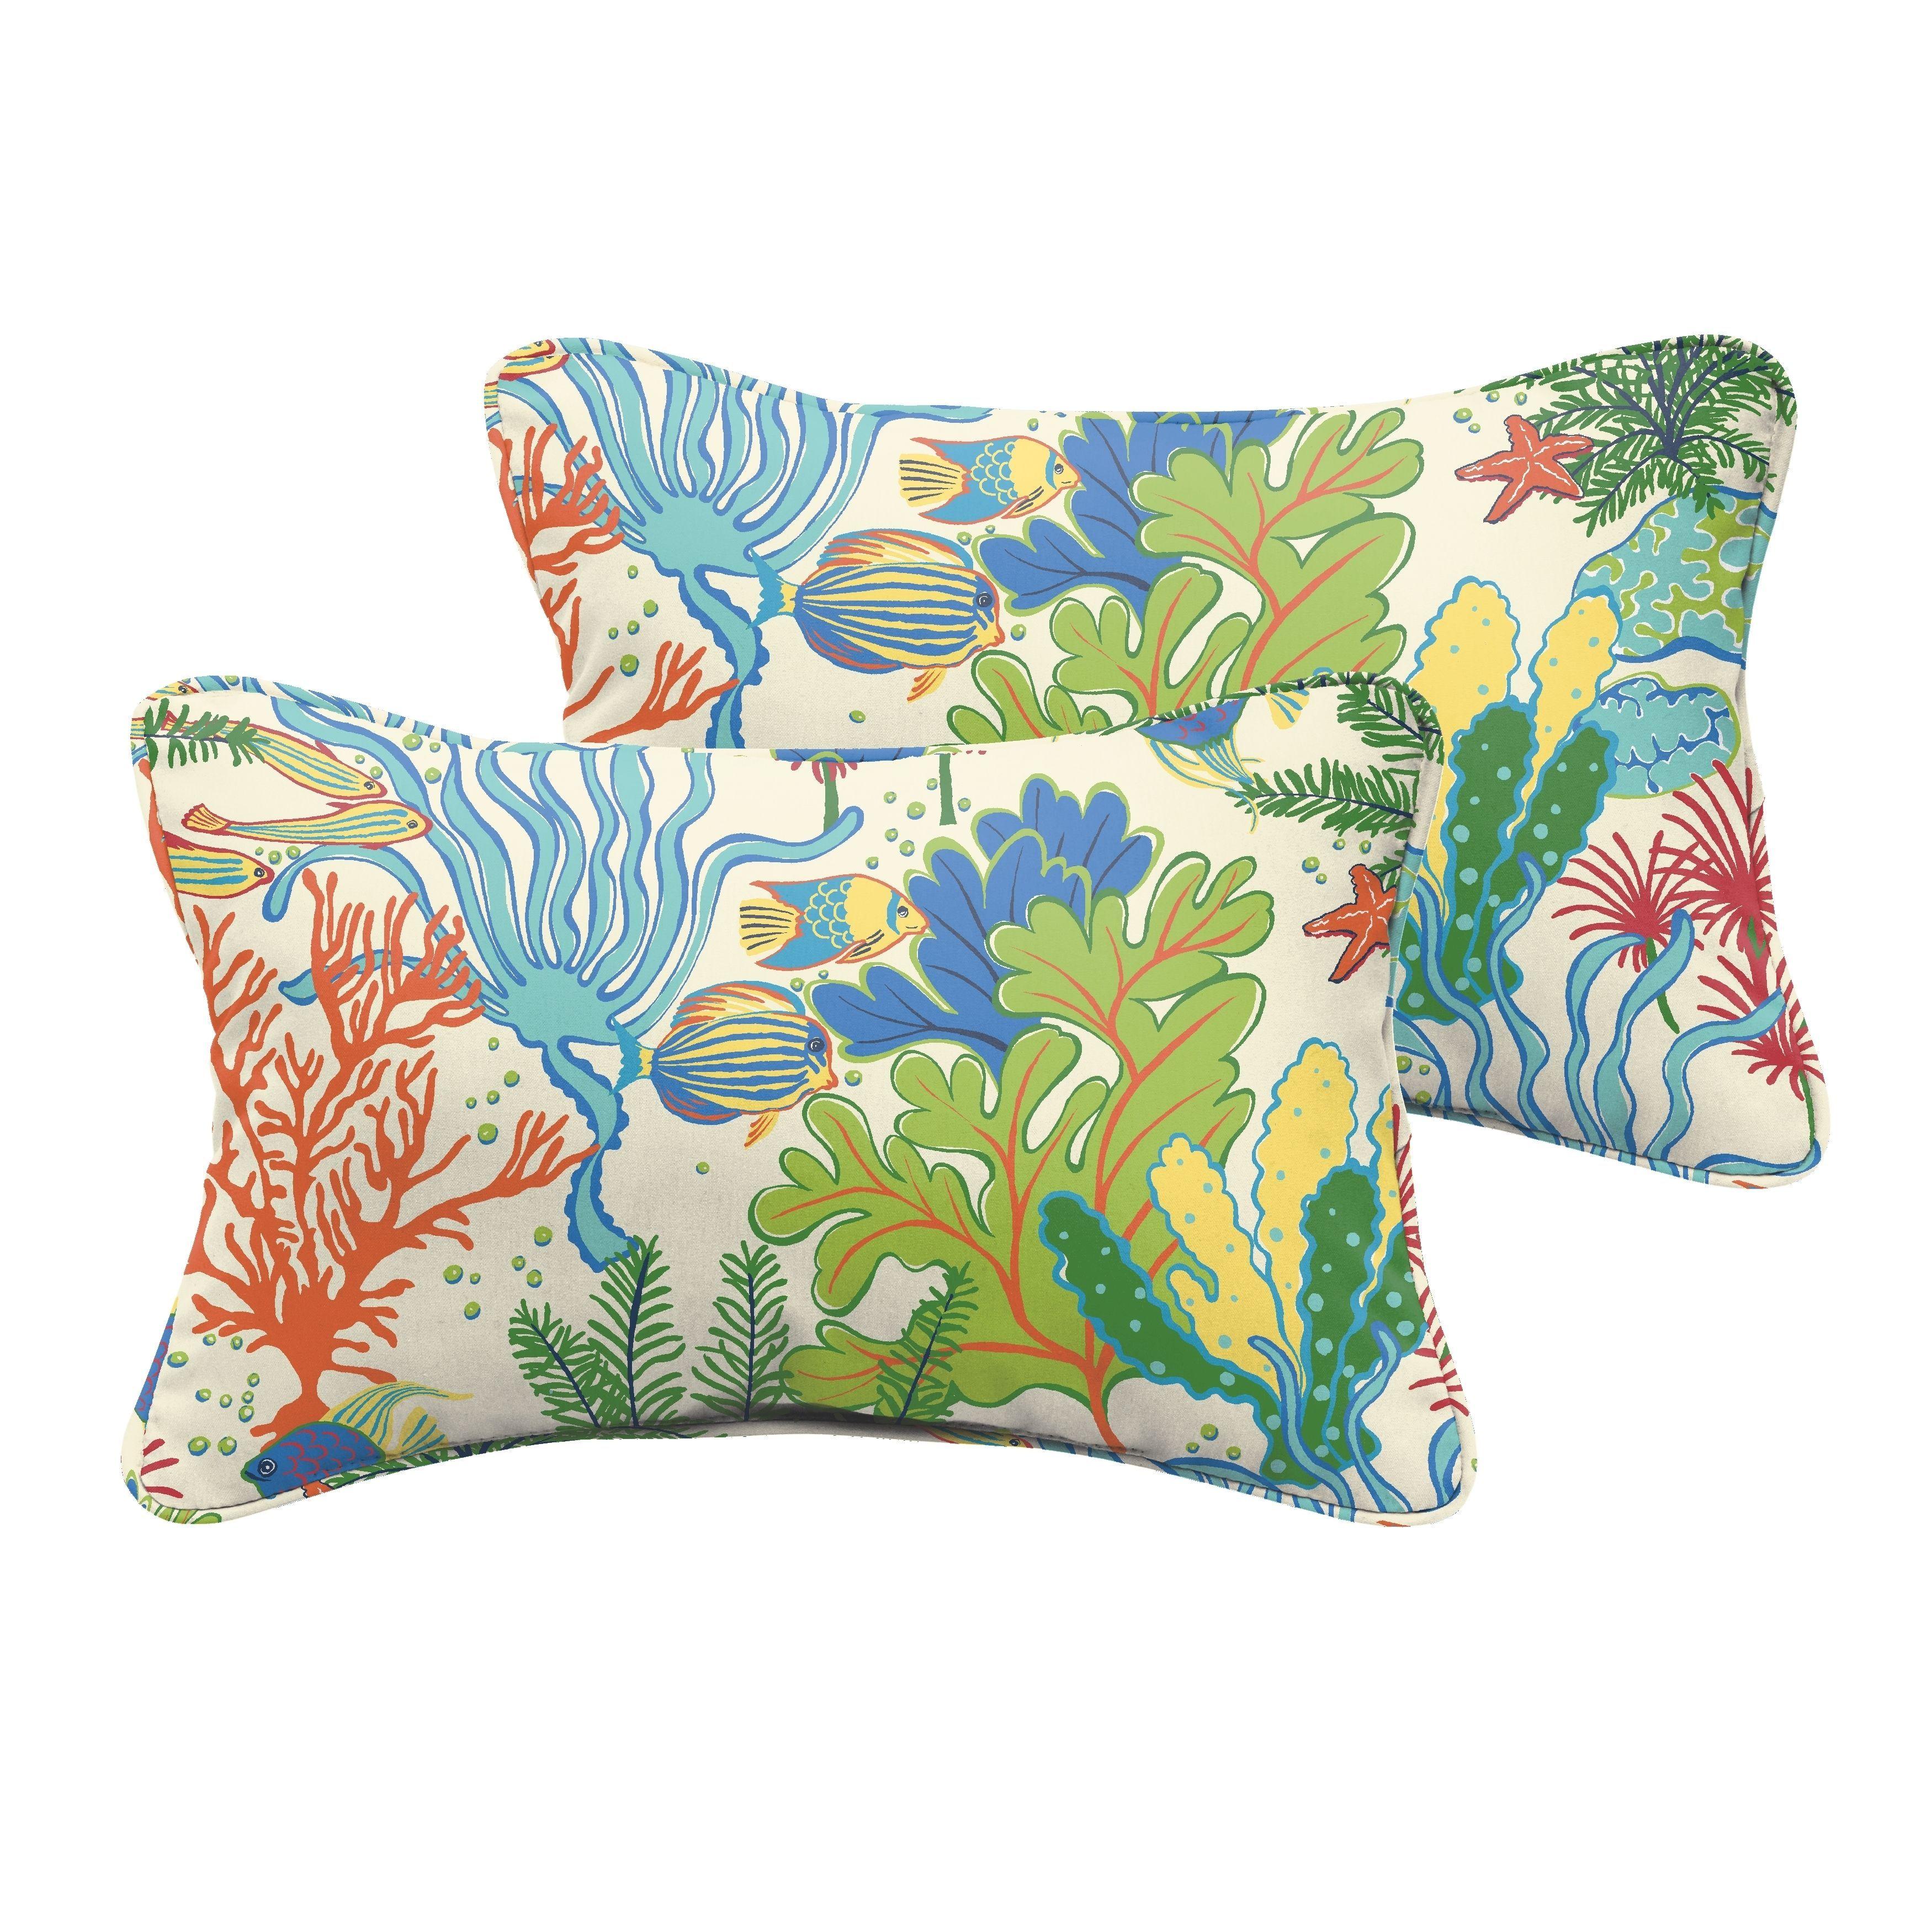 Blue Set of 2 Pillow Perfect Indoor//Outdoor Splish Splash Corded Rectangular Throw Pillow